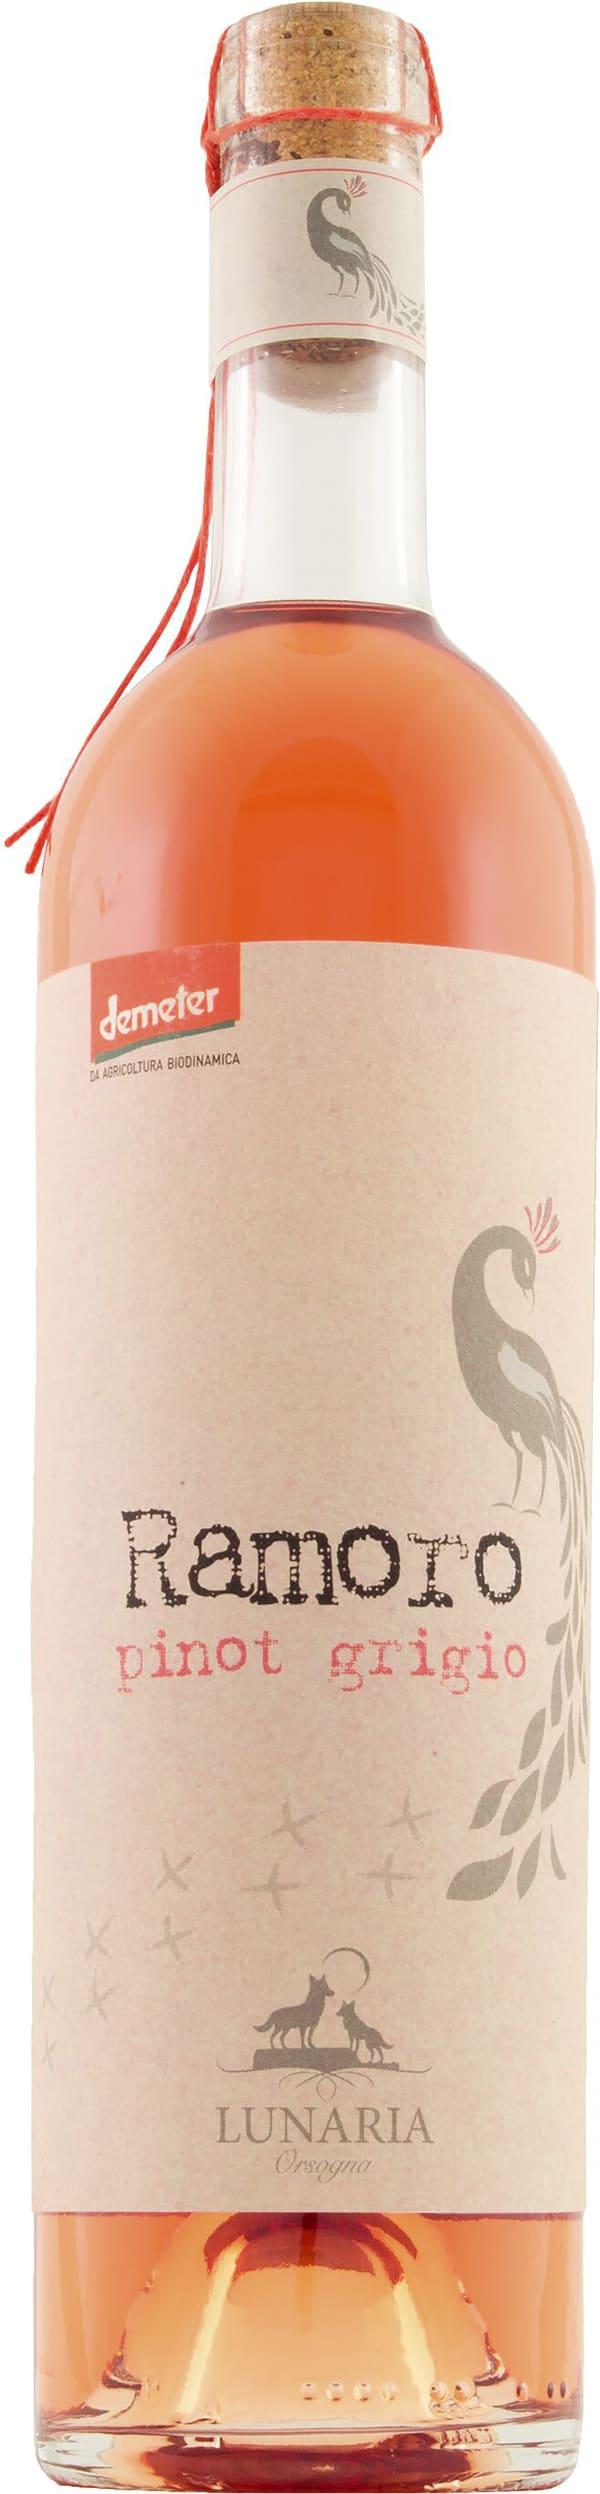 Orsogna Lunaria Ramoro Pinot Grigio Rosé 2020